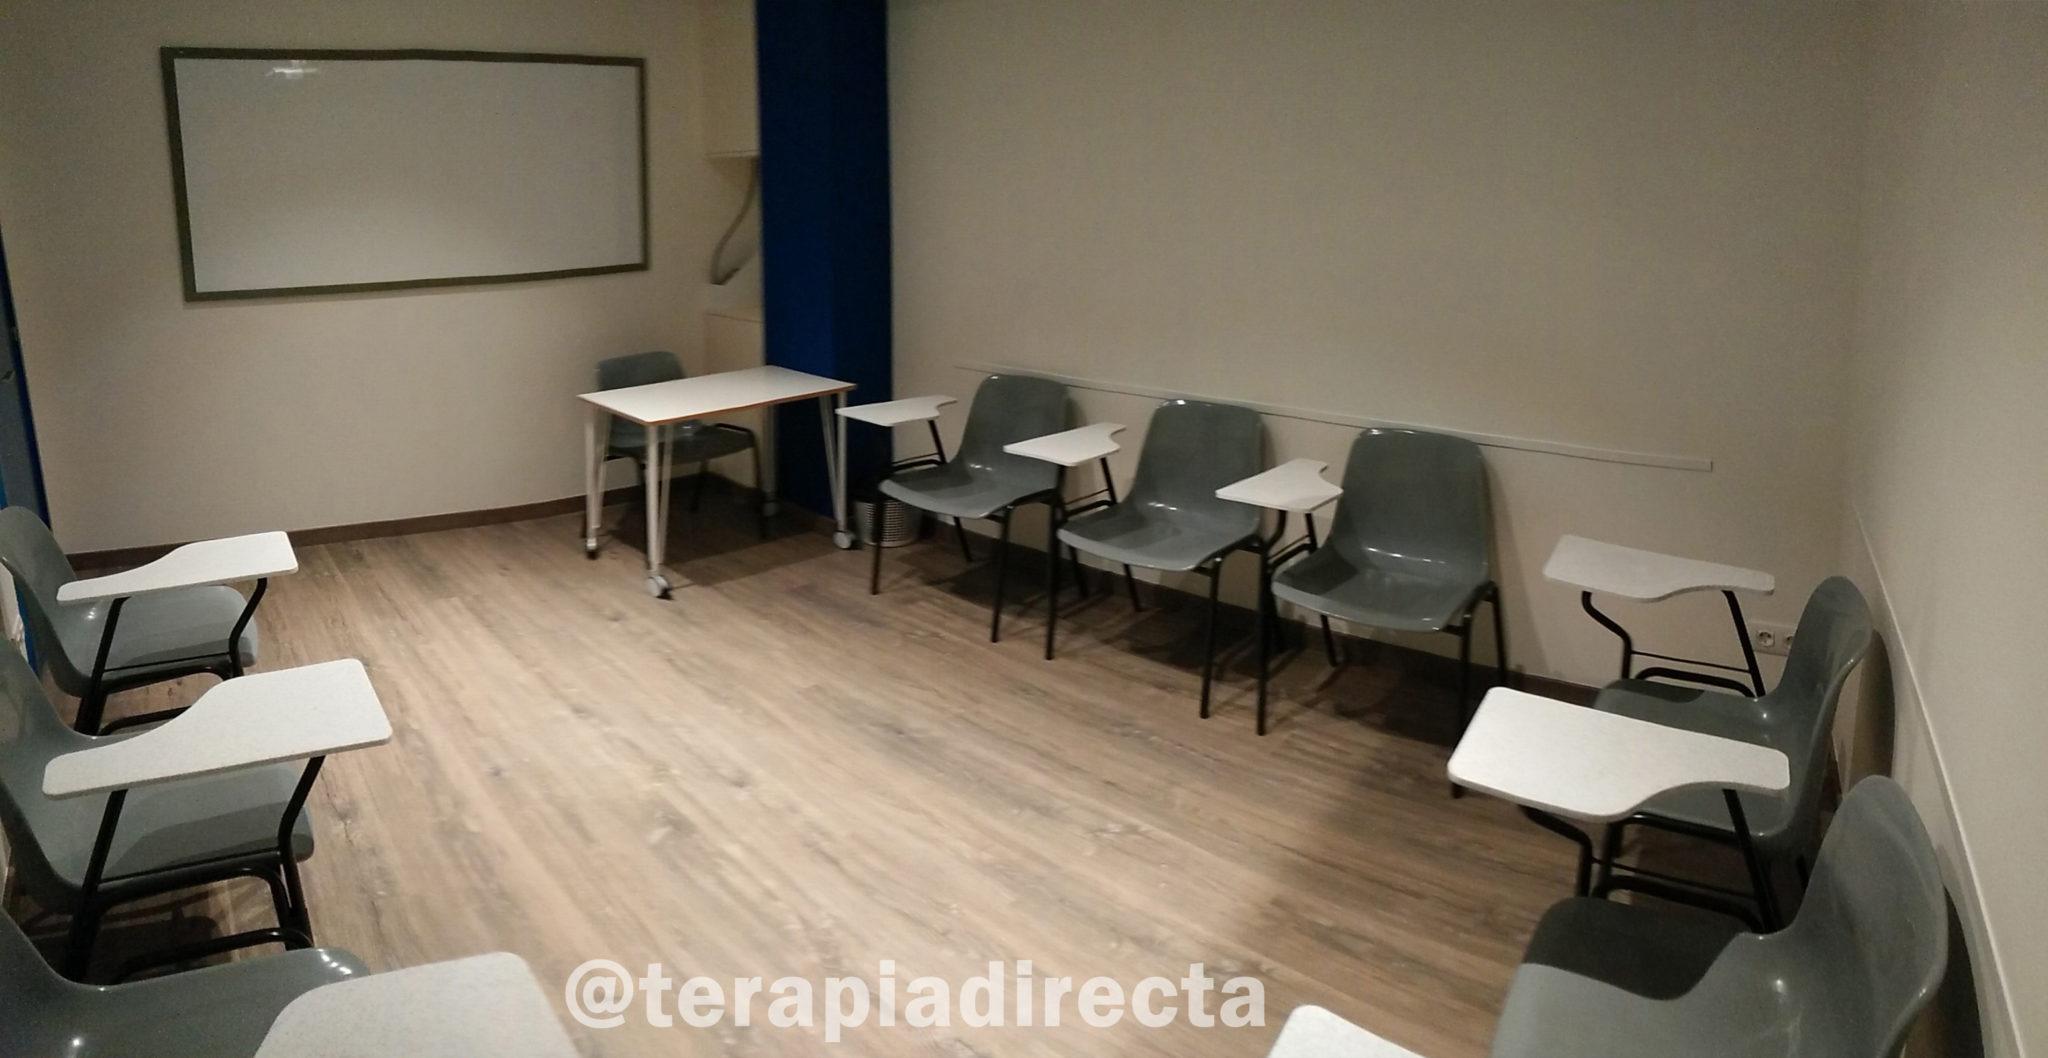 TerapiaDirecta | Alquiler de salas